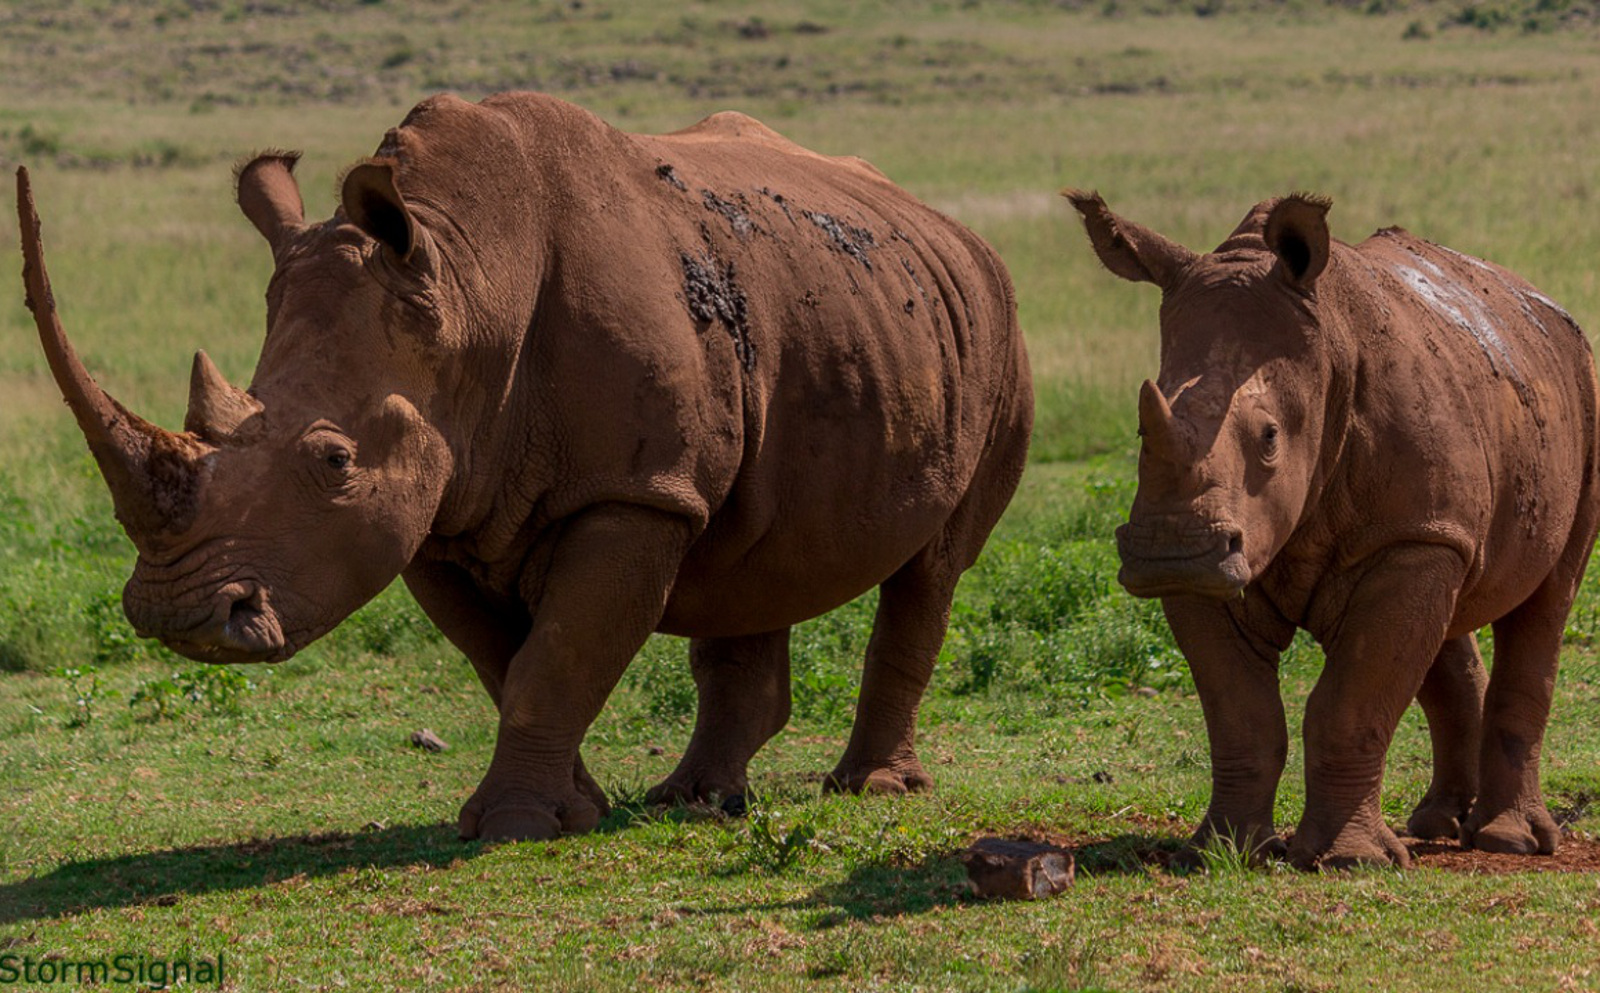 Should We Celebrate Rhino Horn and Ivory Seizures?